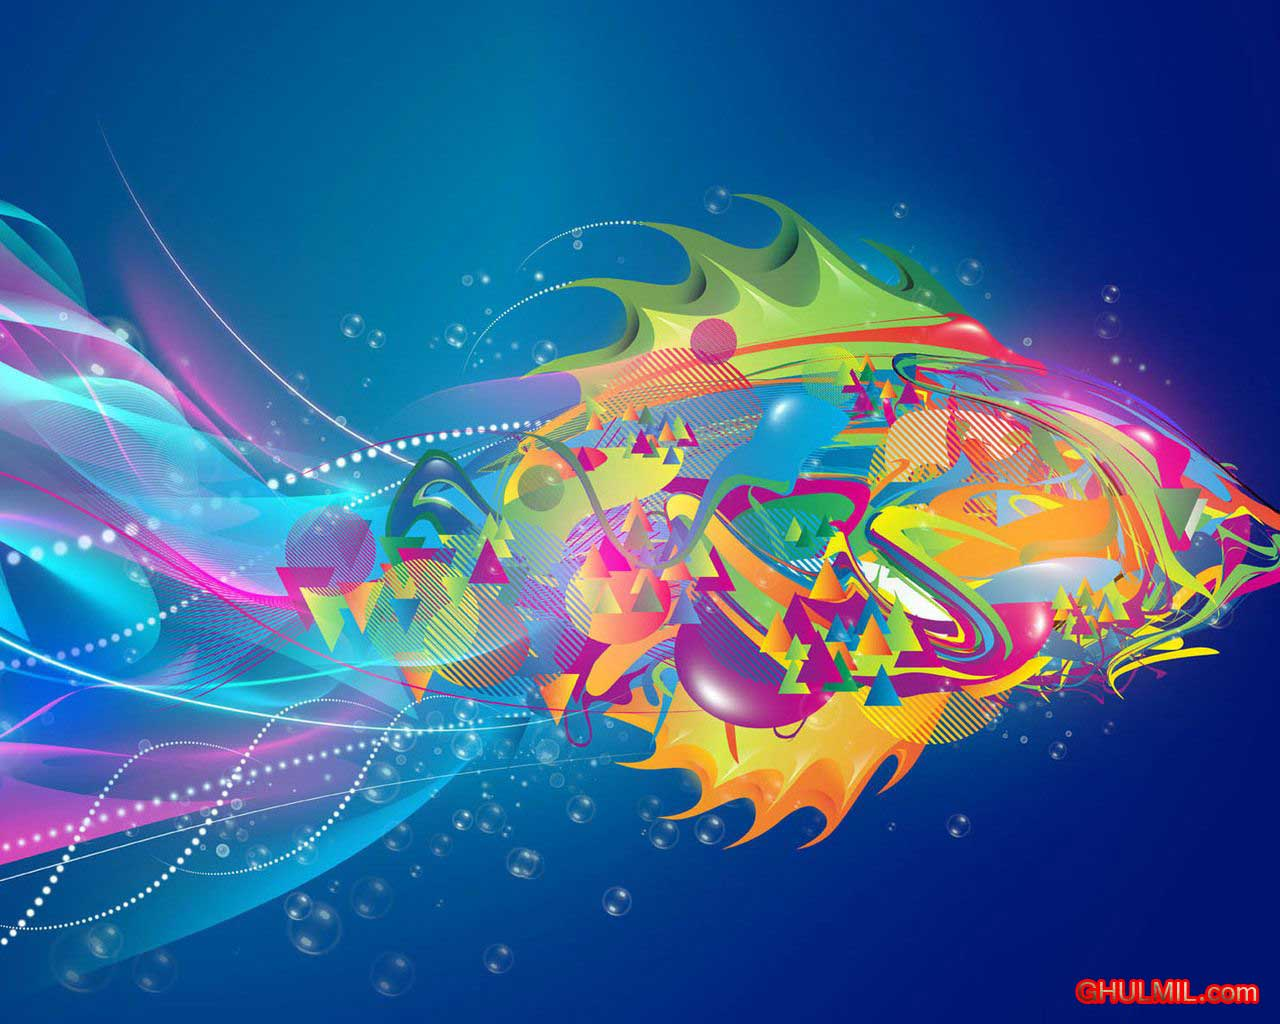 S Name Wallpaper Free Download | New hd wallon